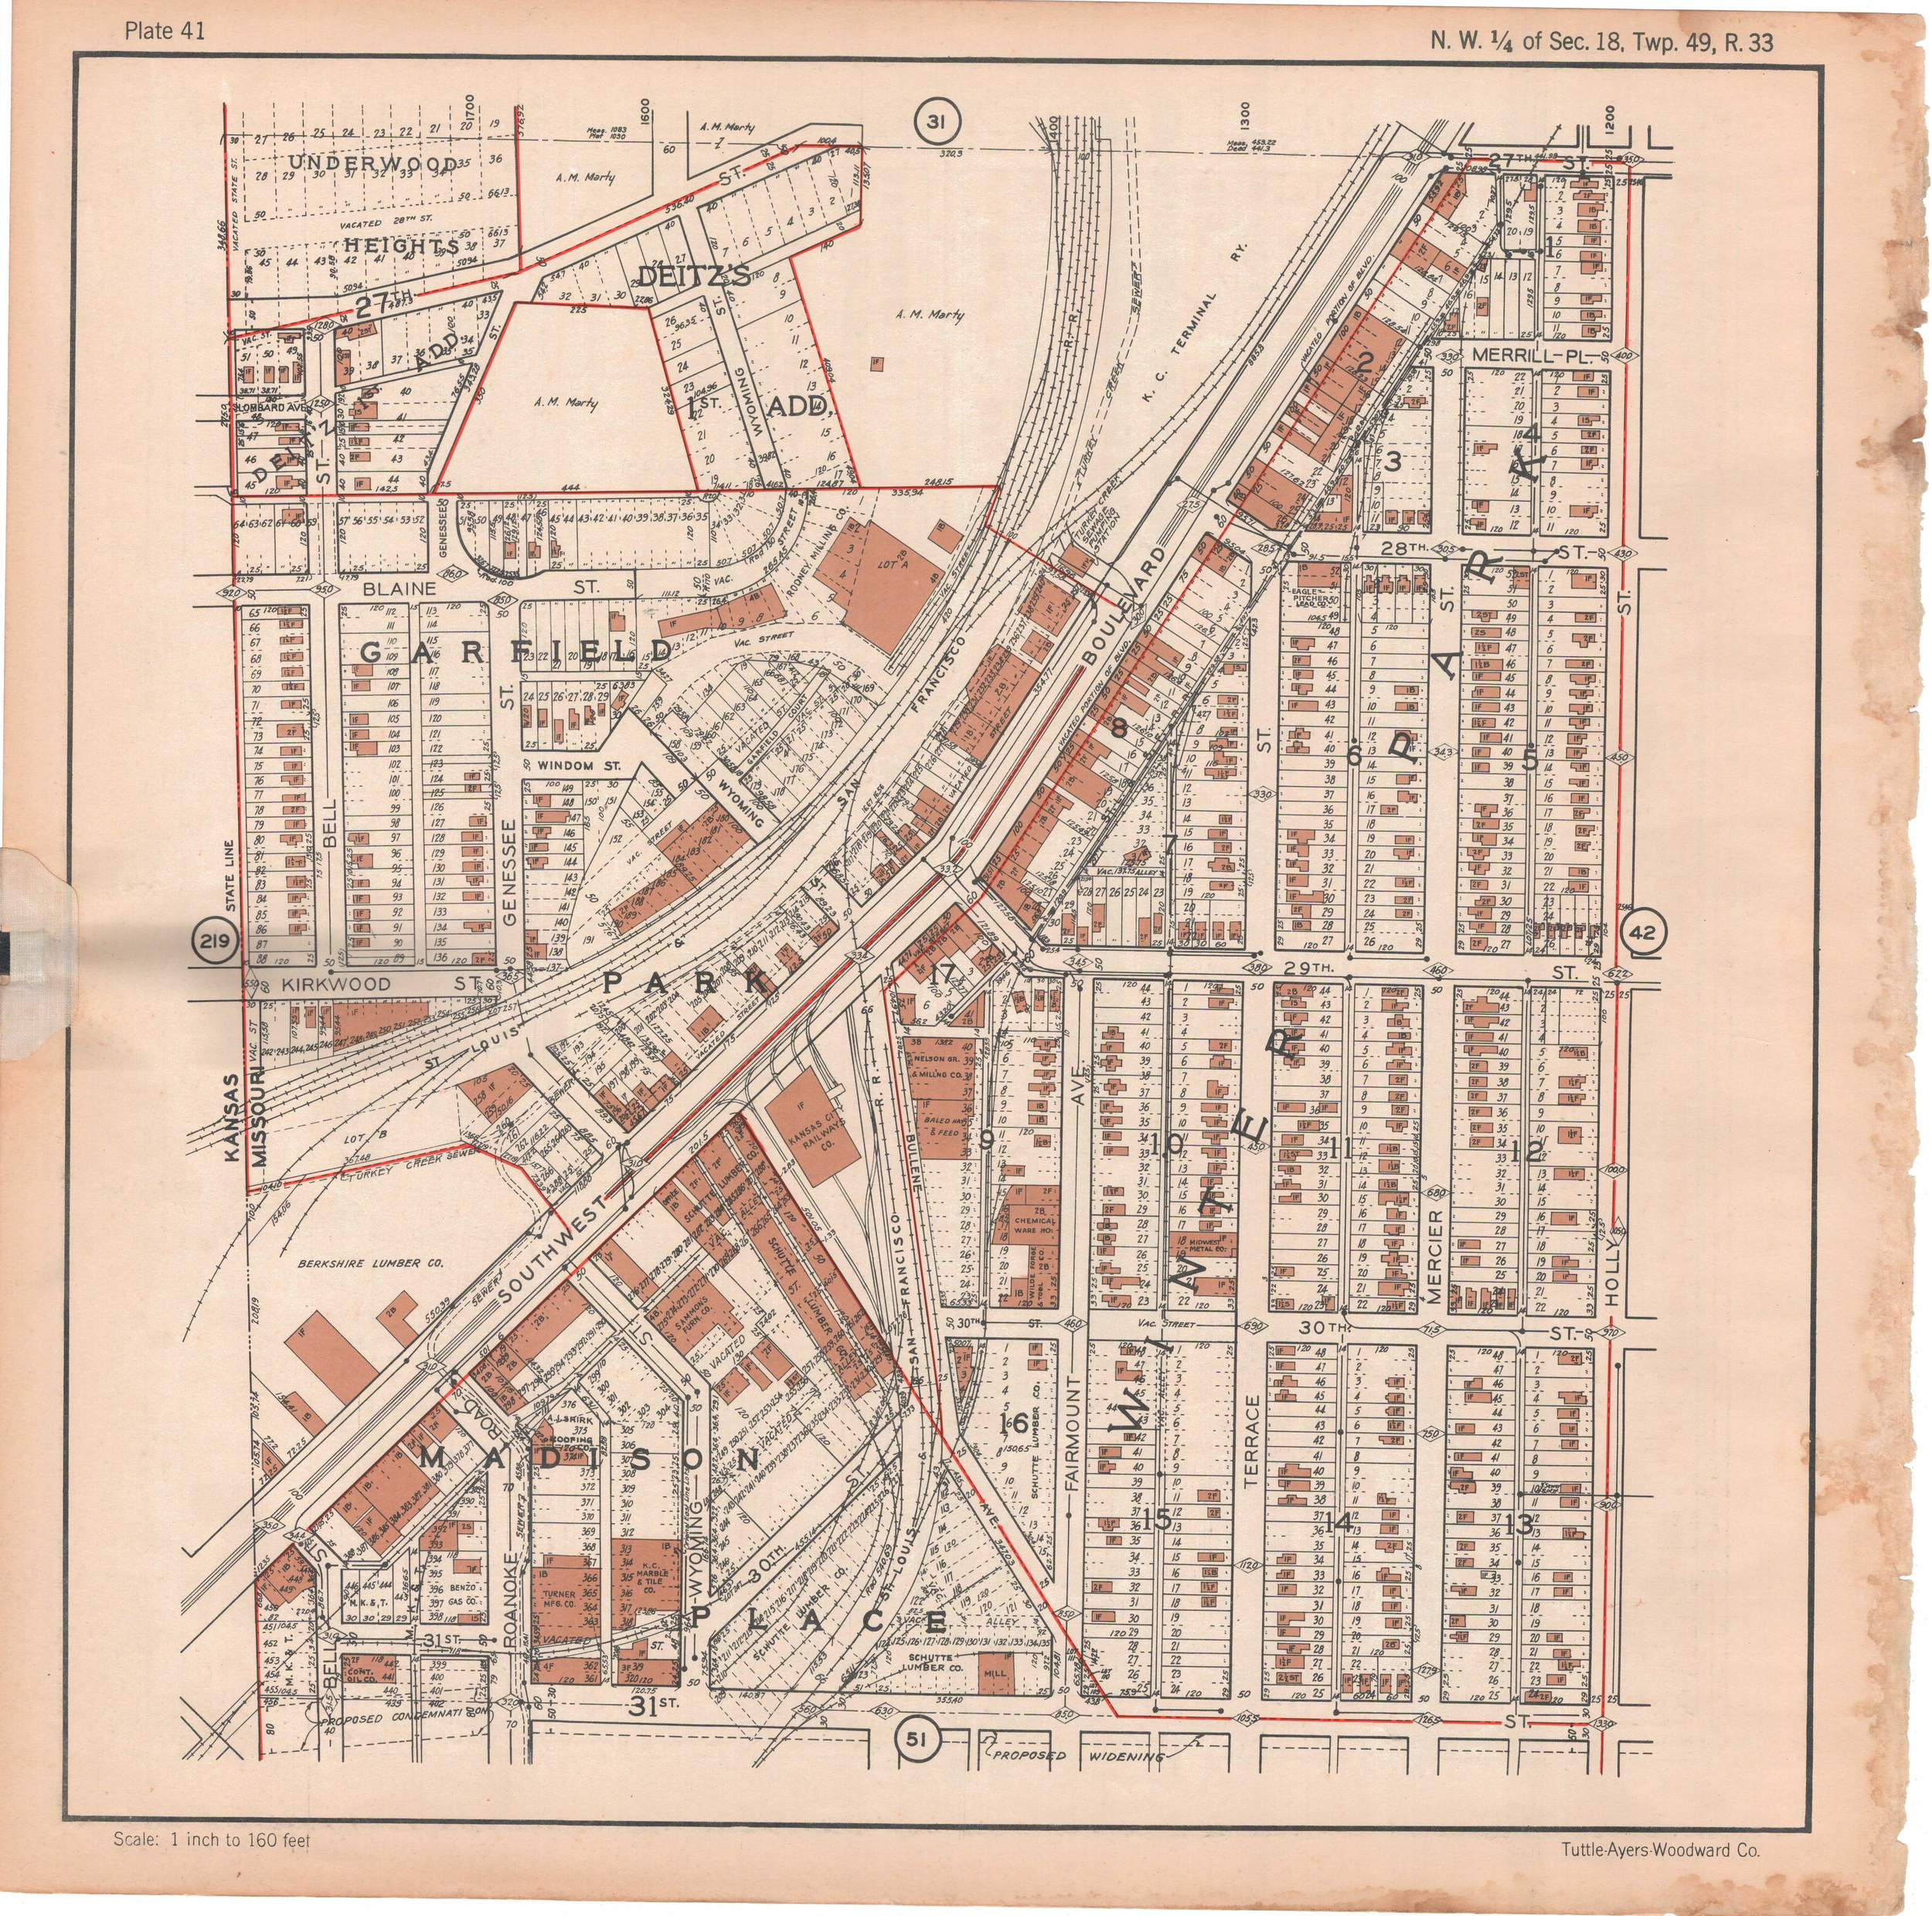 1925 TUTTLE_AYERS_Plate 41.JPG